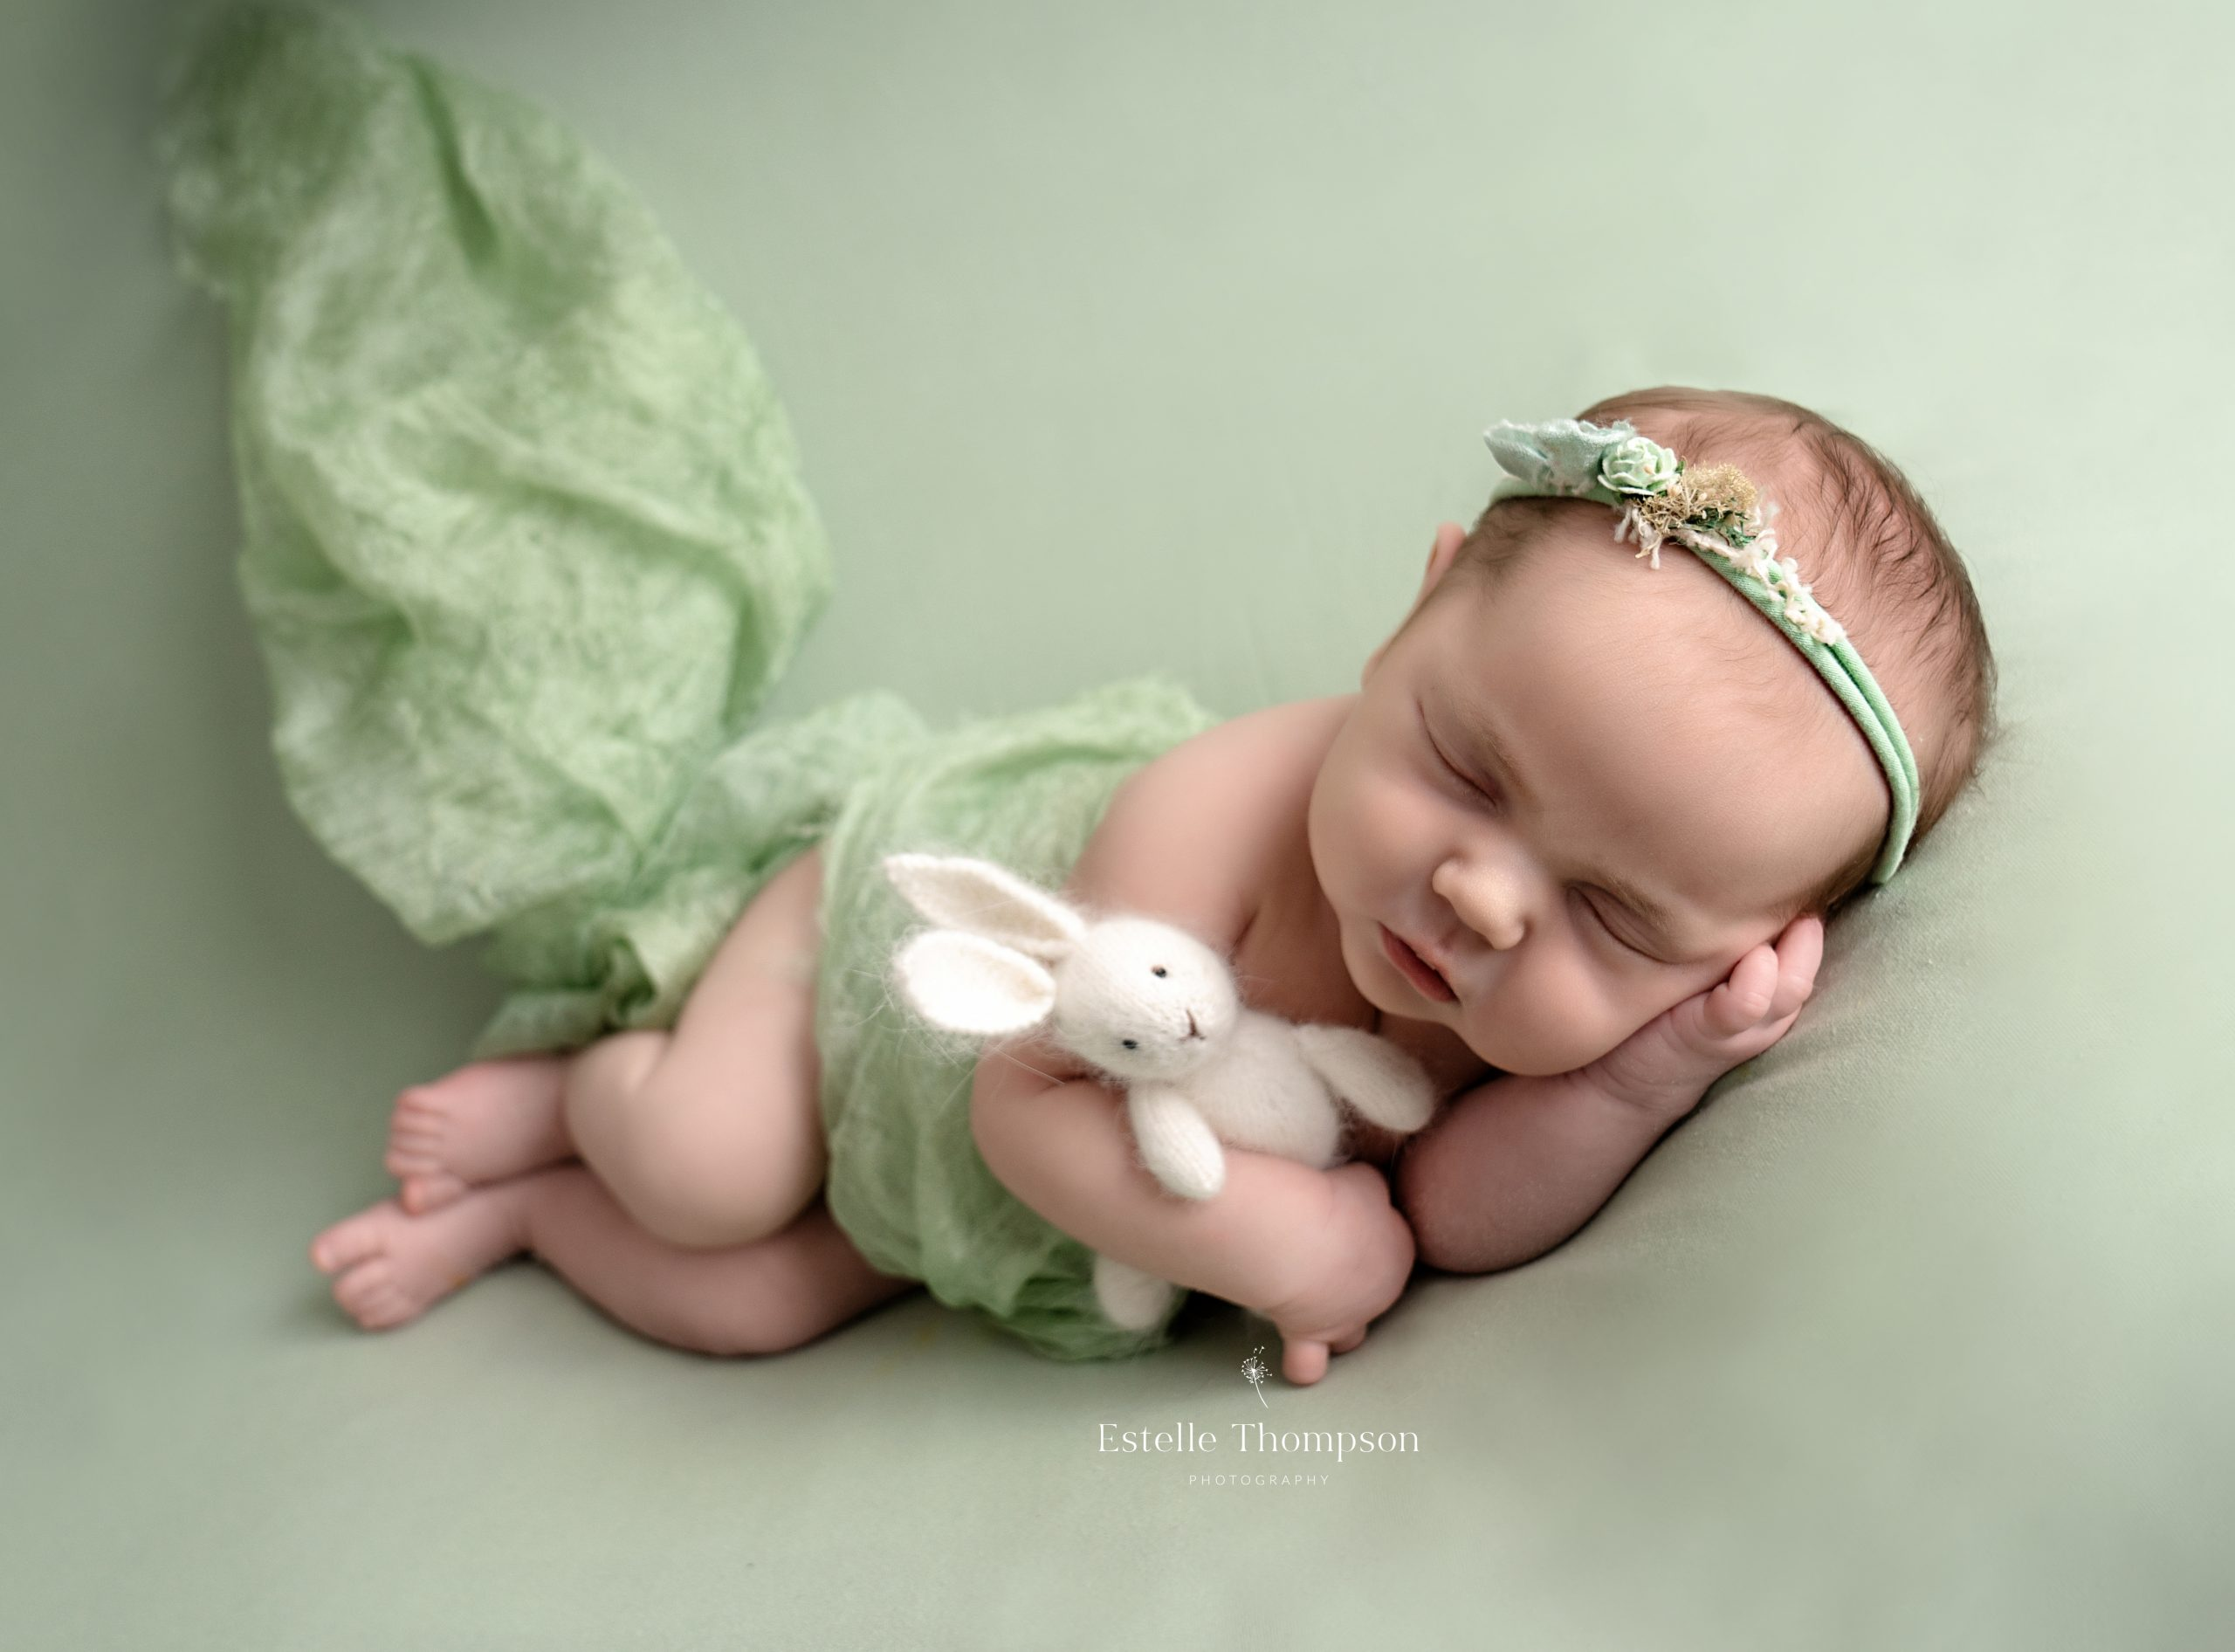 A newborn baby girl lays sleeping on a green blanket holding a white bunny by Sevenoaks newborn photographer